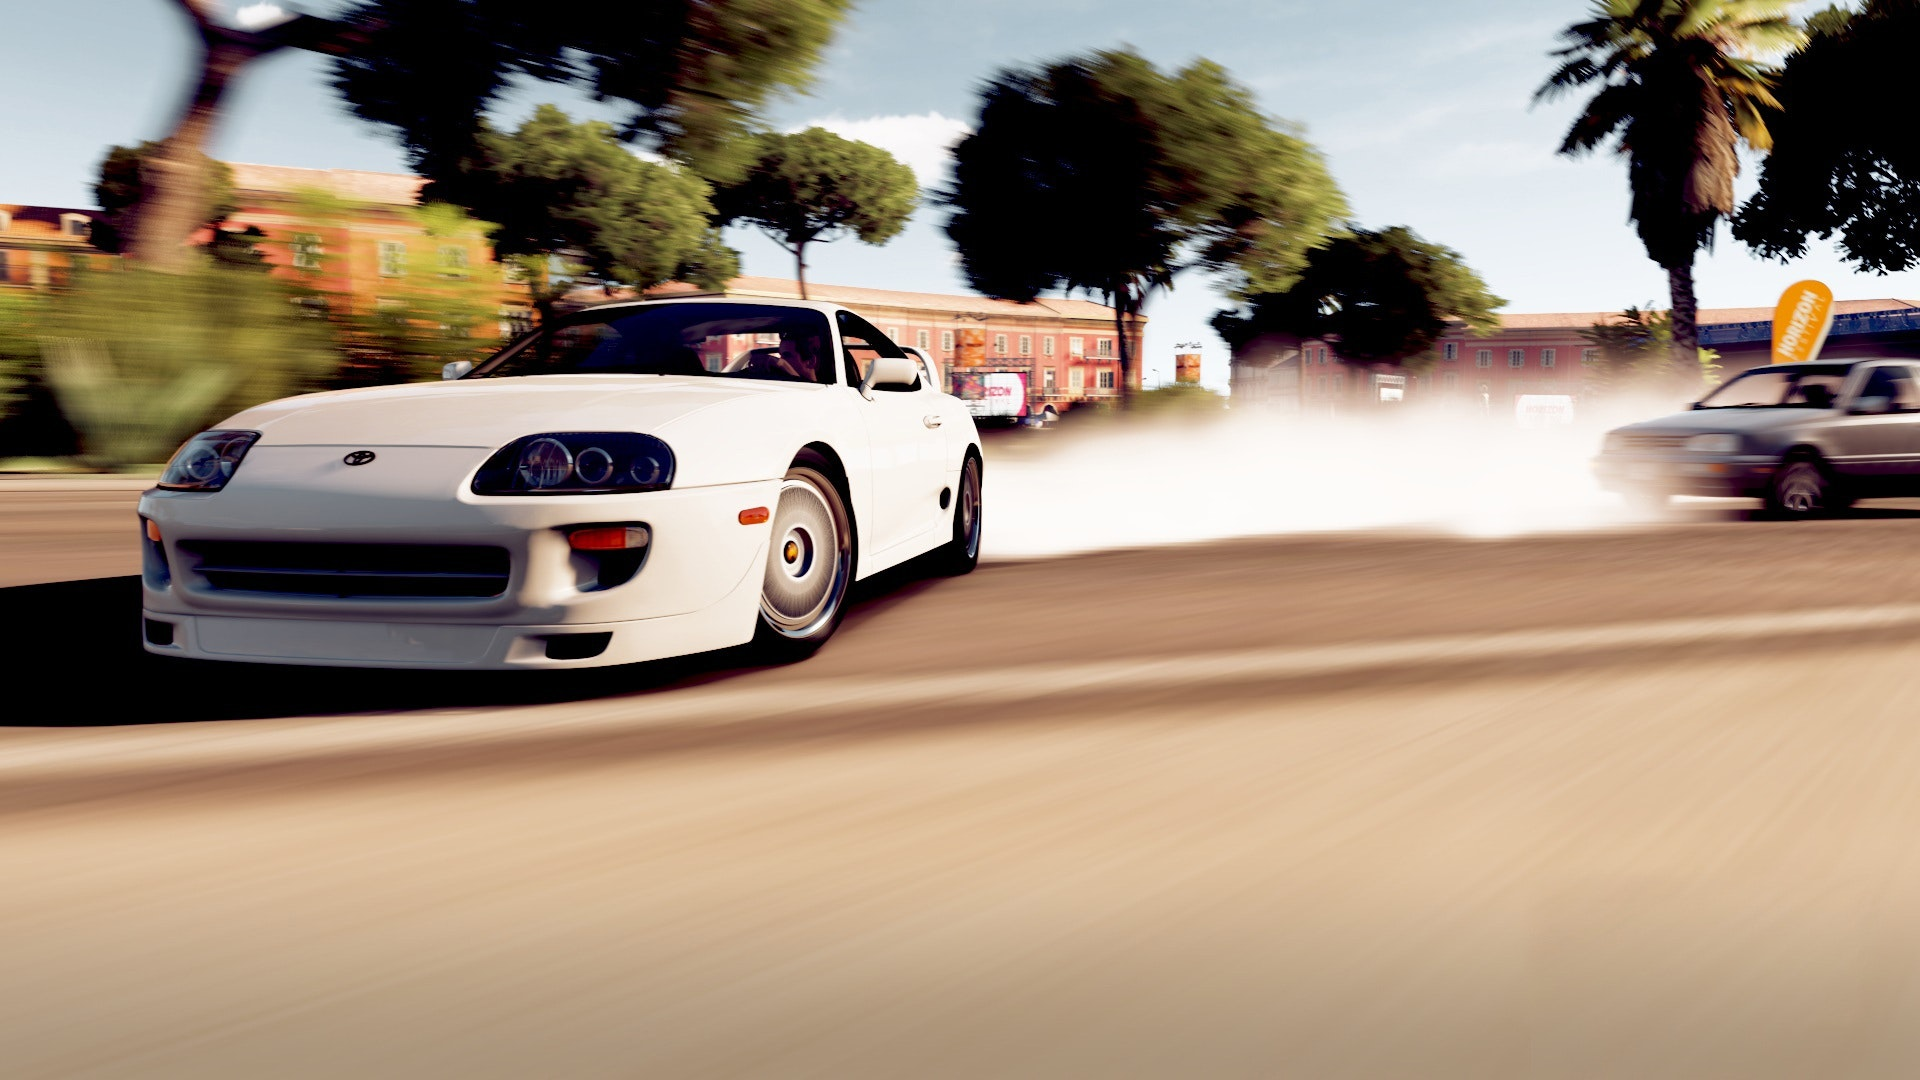 Image Result For Fast Sport Cars Wallpaper